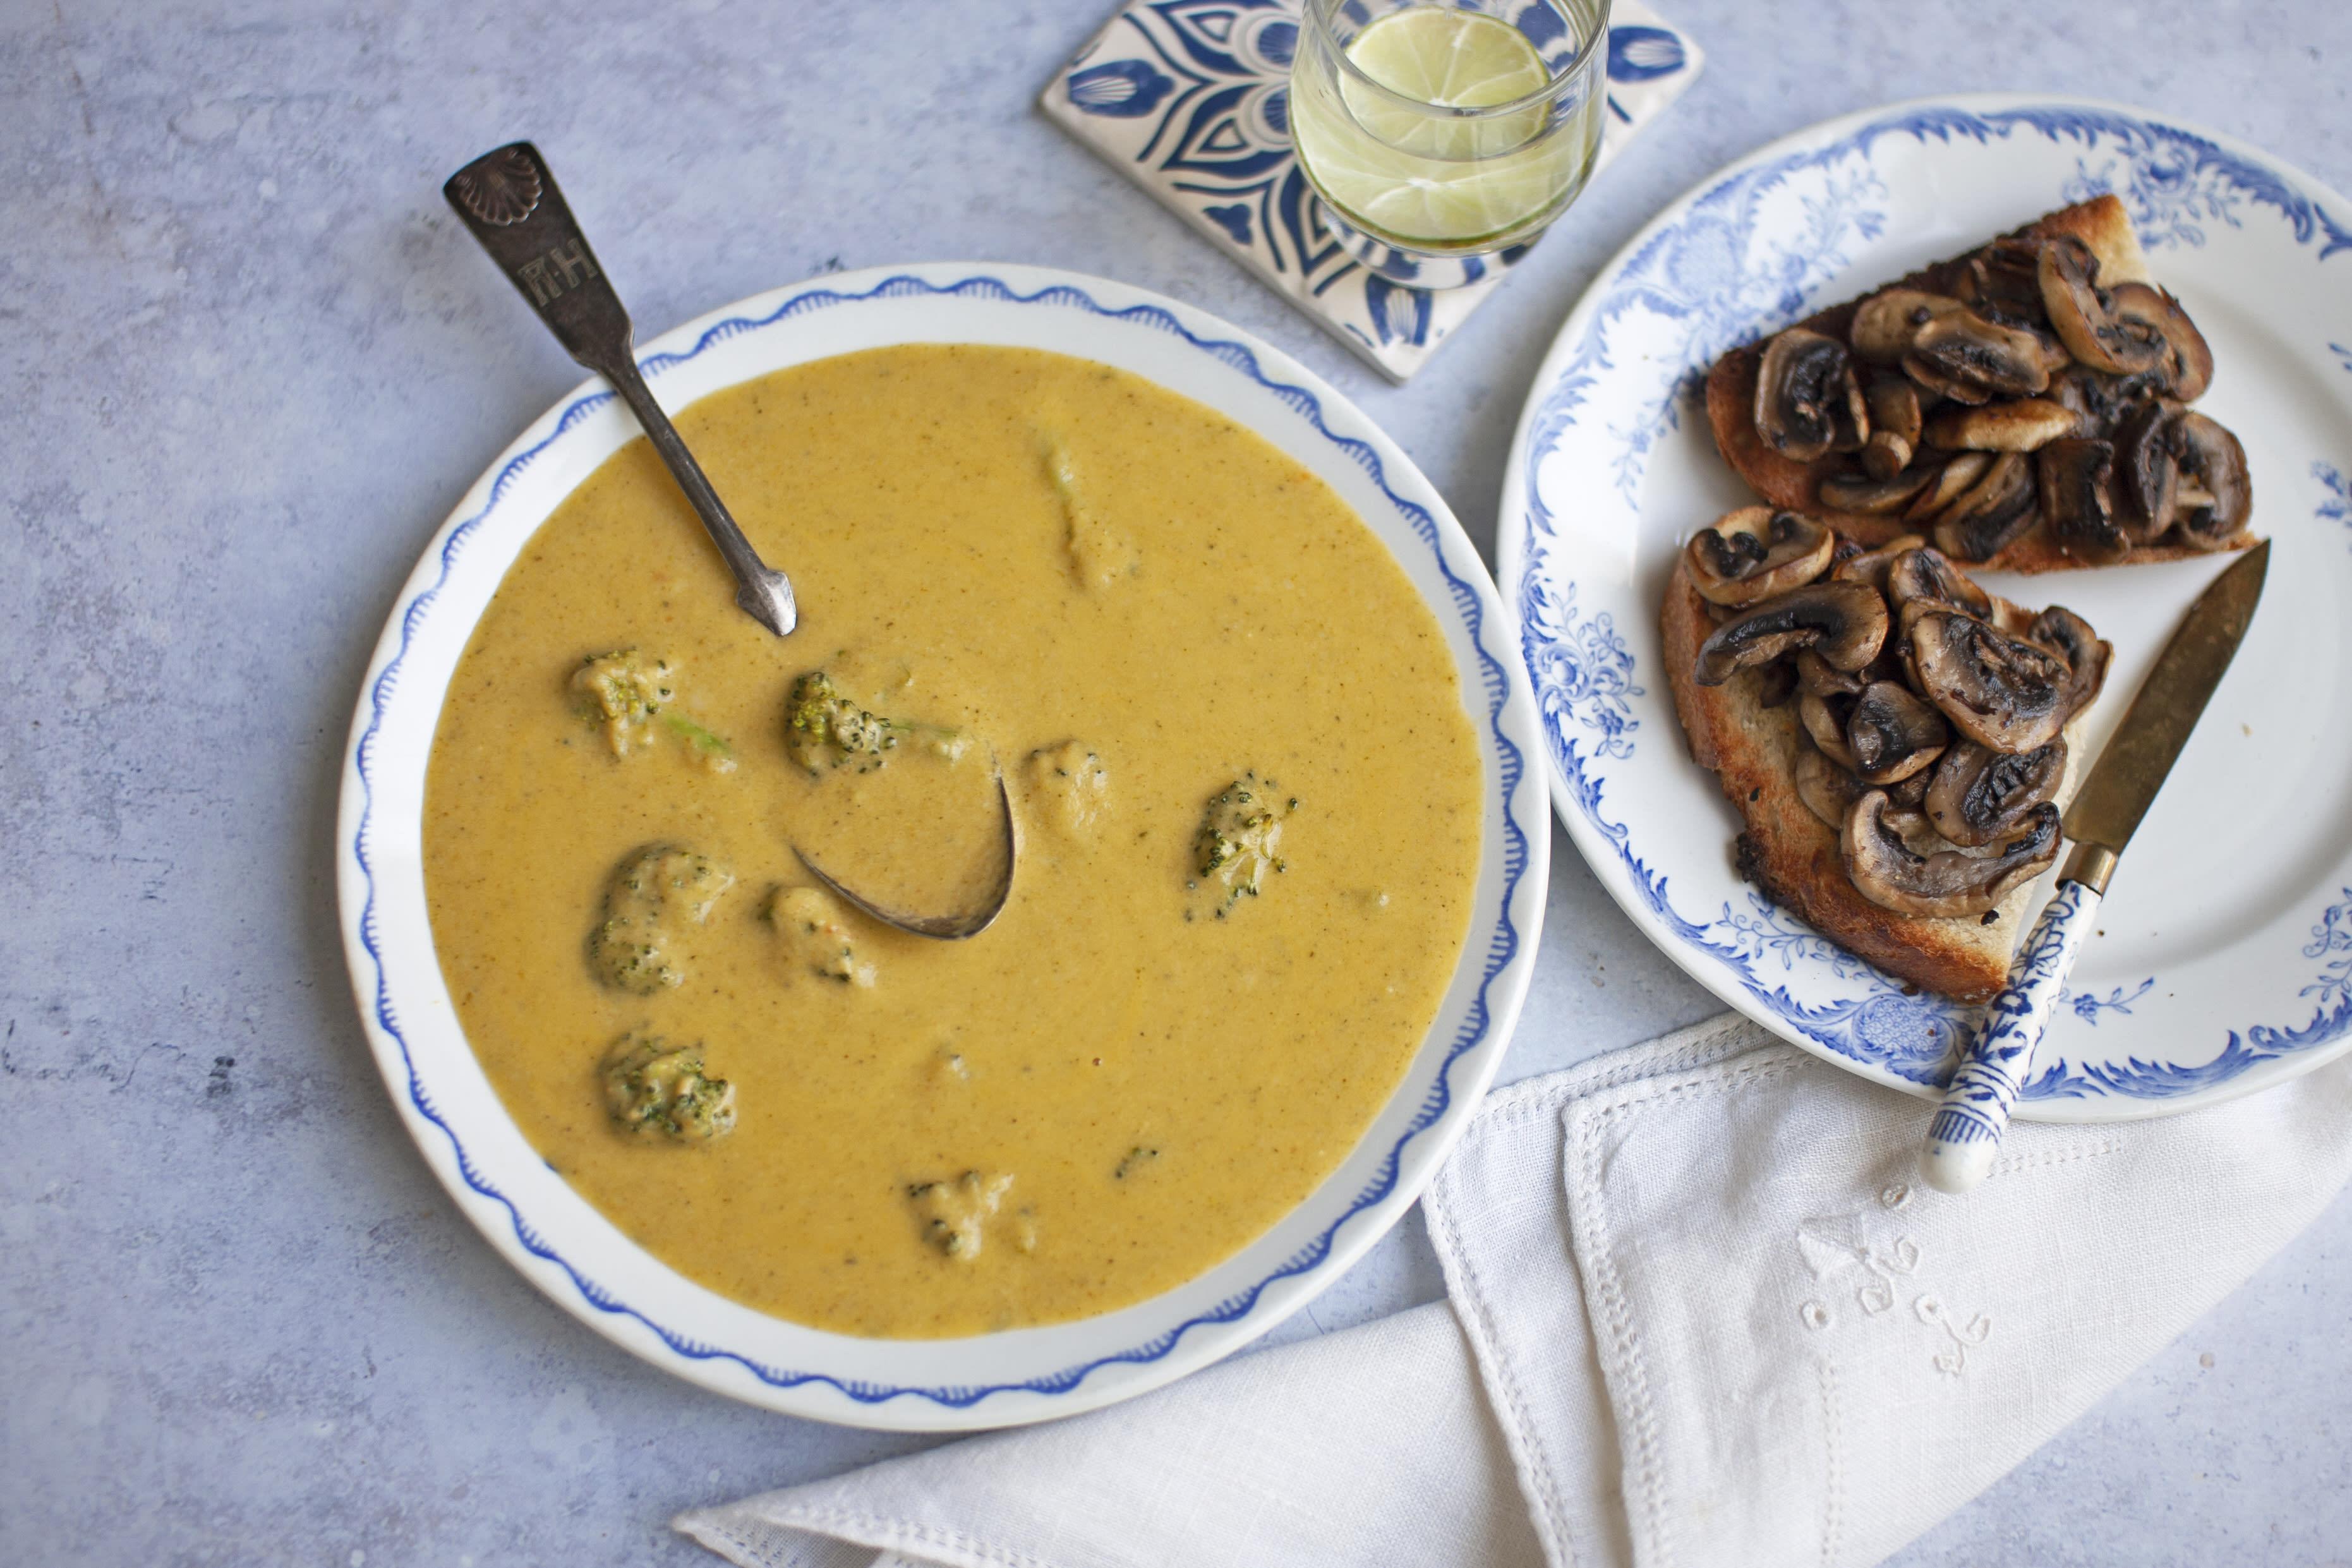 Broccoli and Cheddar Soup with Mushroom Crostini